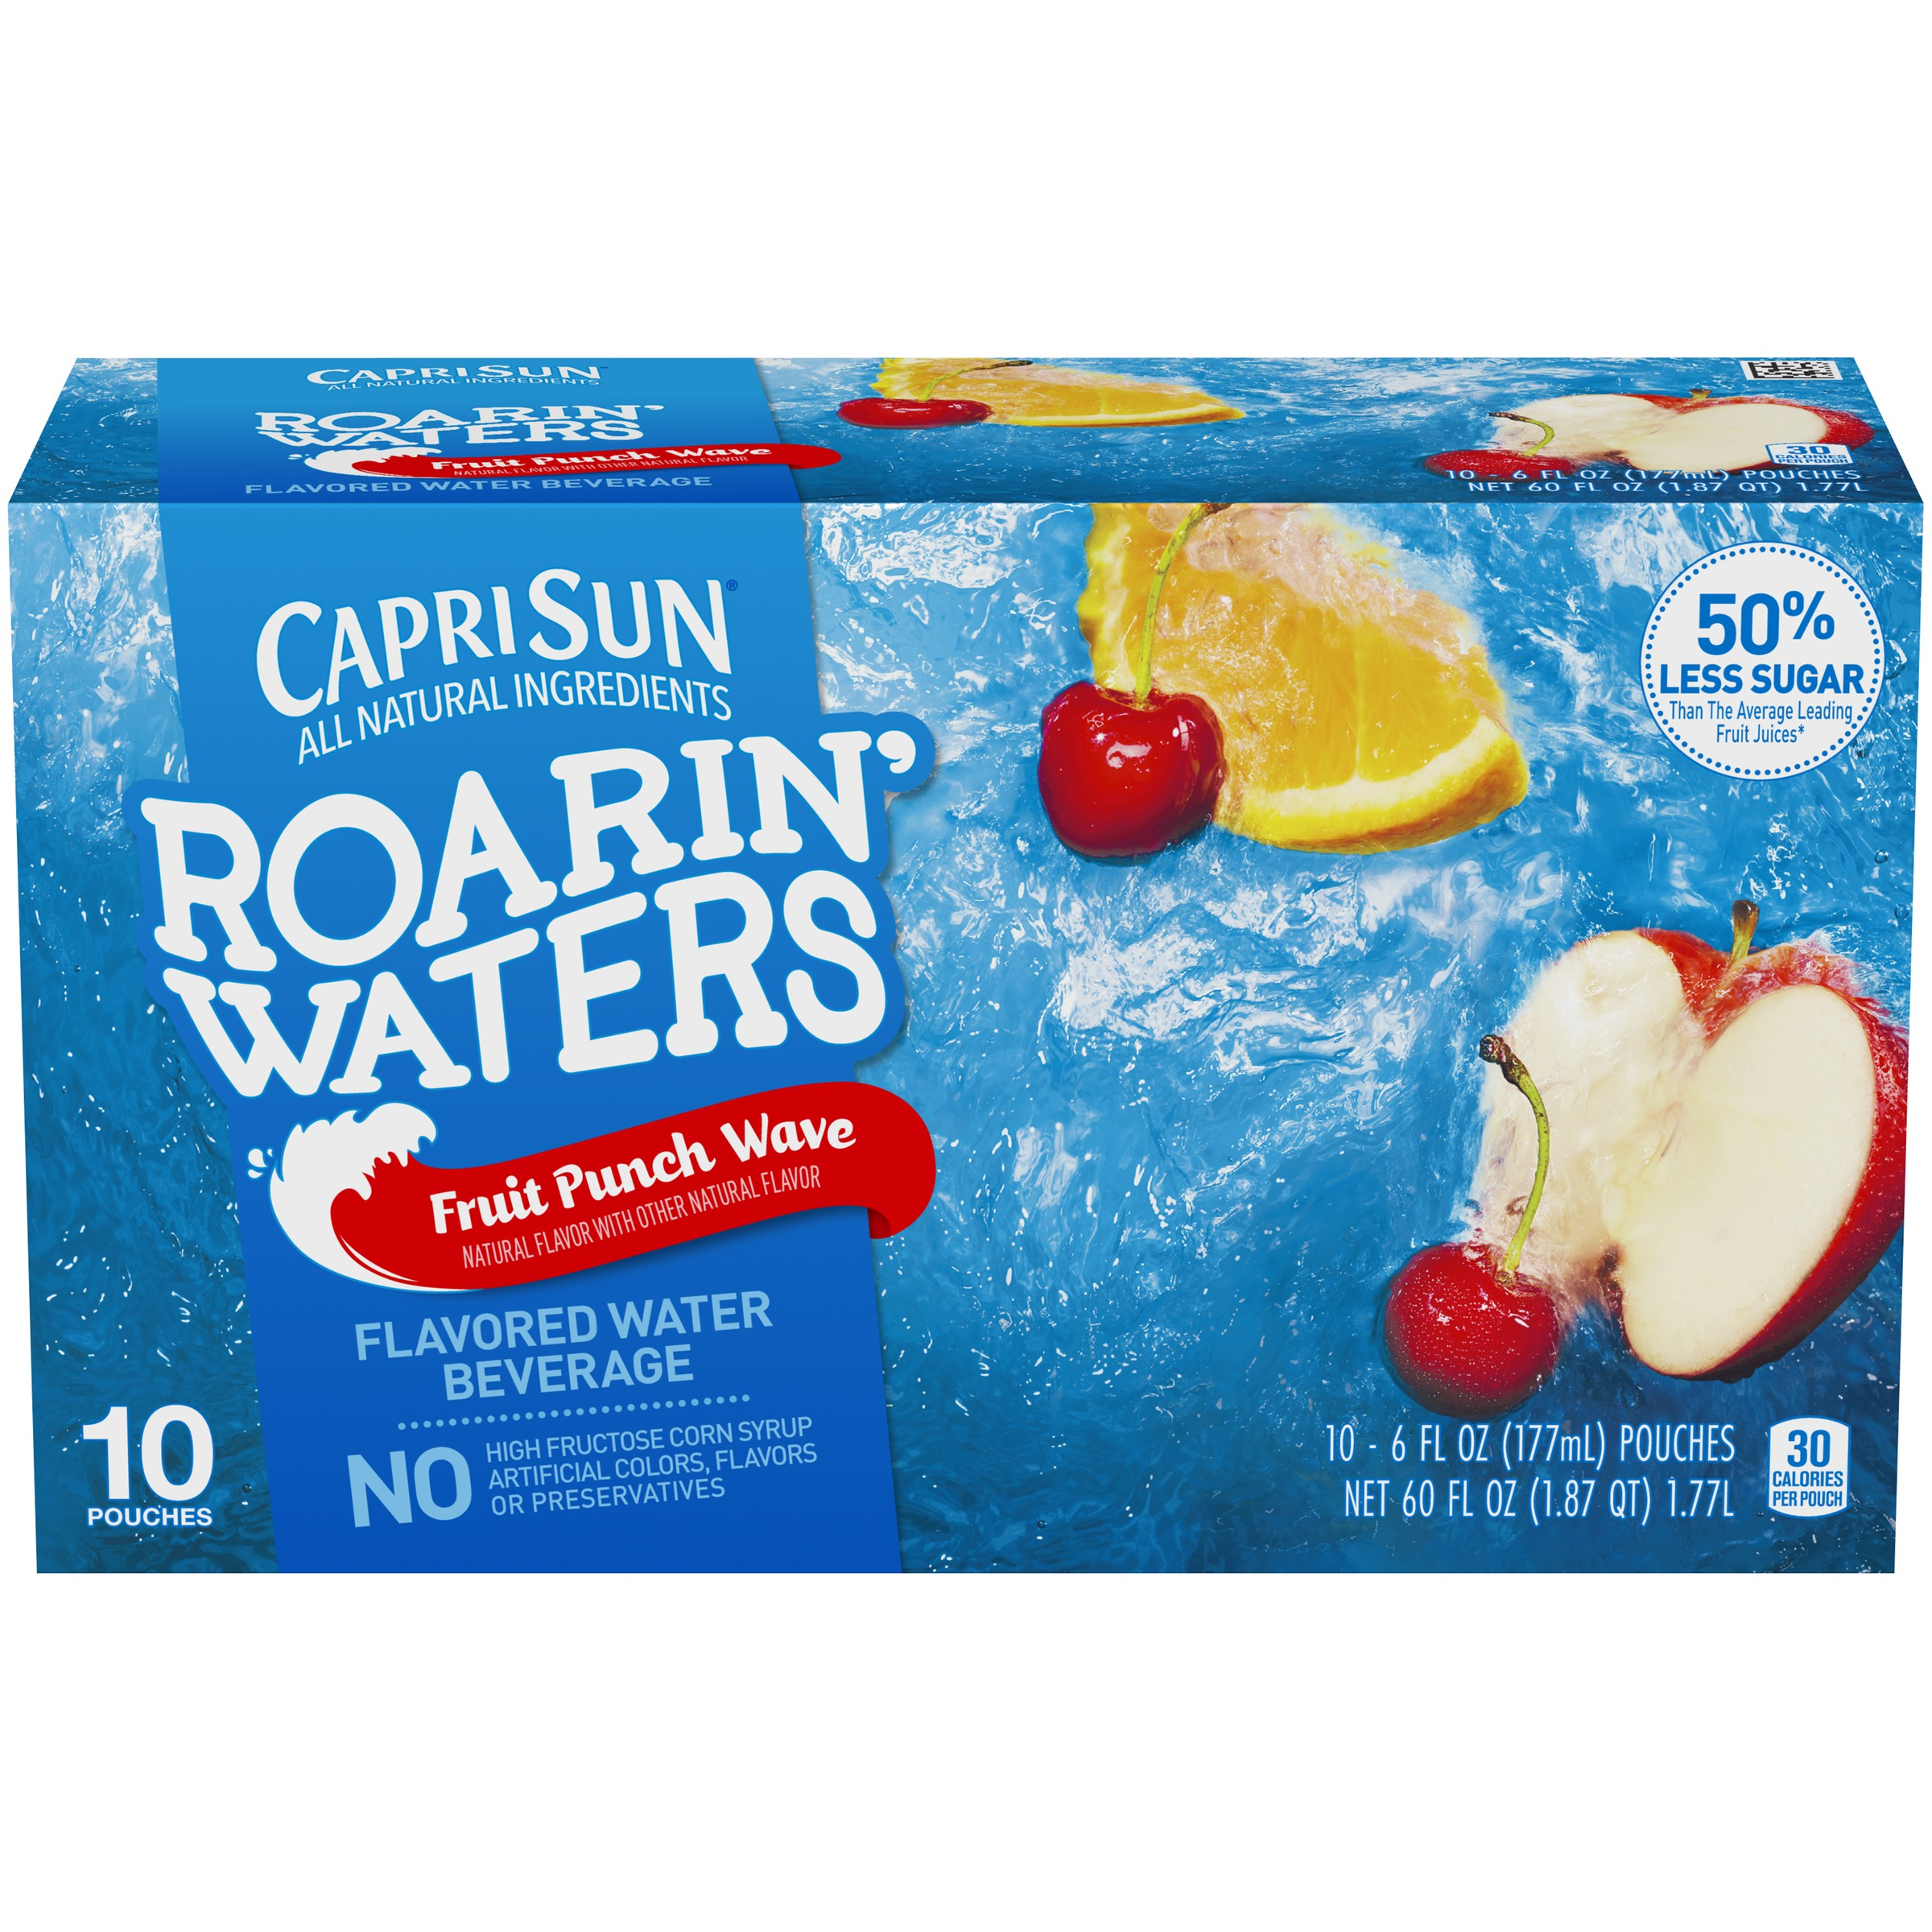 Capri Sun Roarin' Waters Fruit Punch Wave Flavored Water Beverage 10-6 fl. oz. Pouches